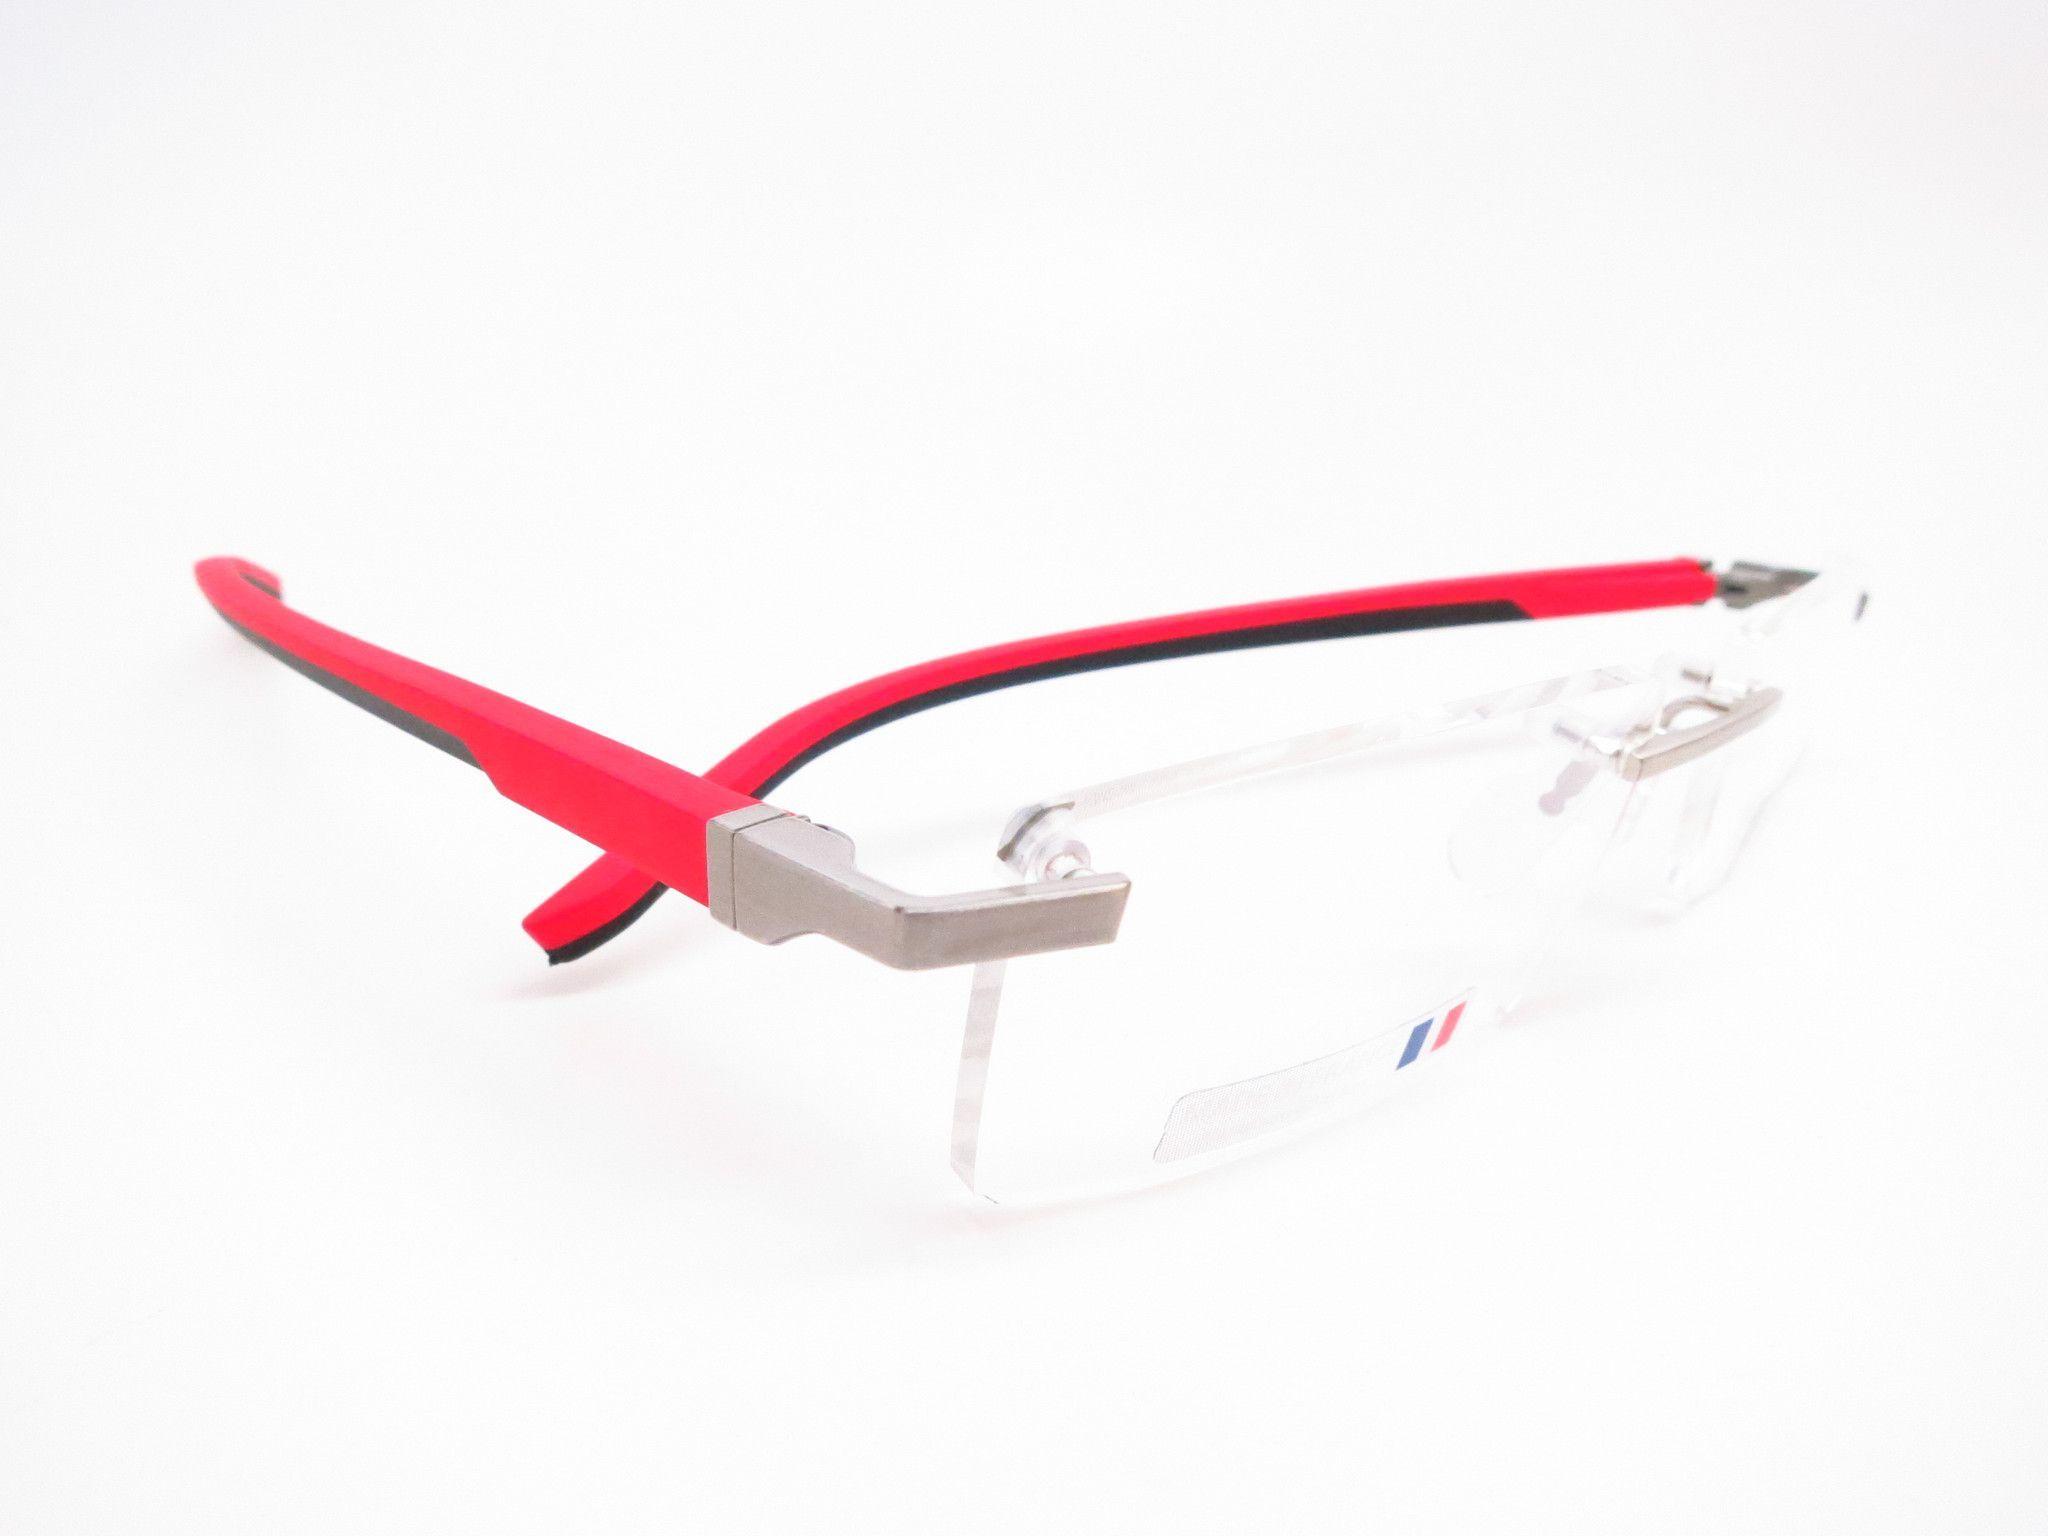 Tag Heuer TH 0841 005 Red / Black Automatic Eyeglasses   Tag Heuer ...